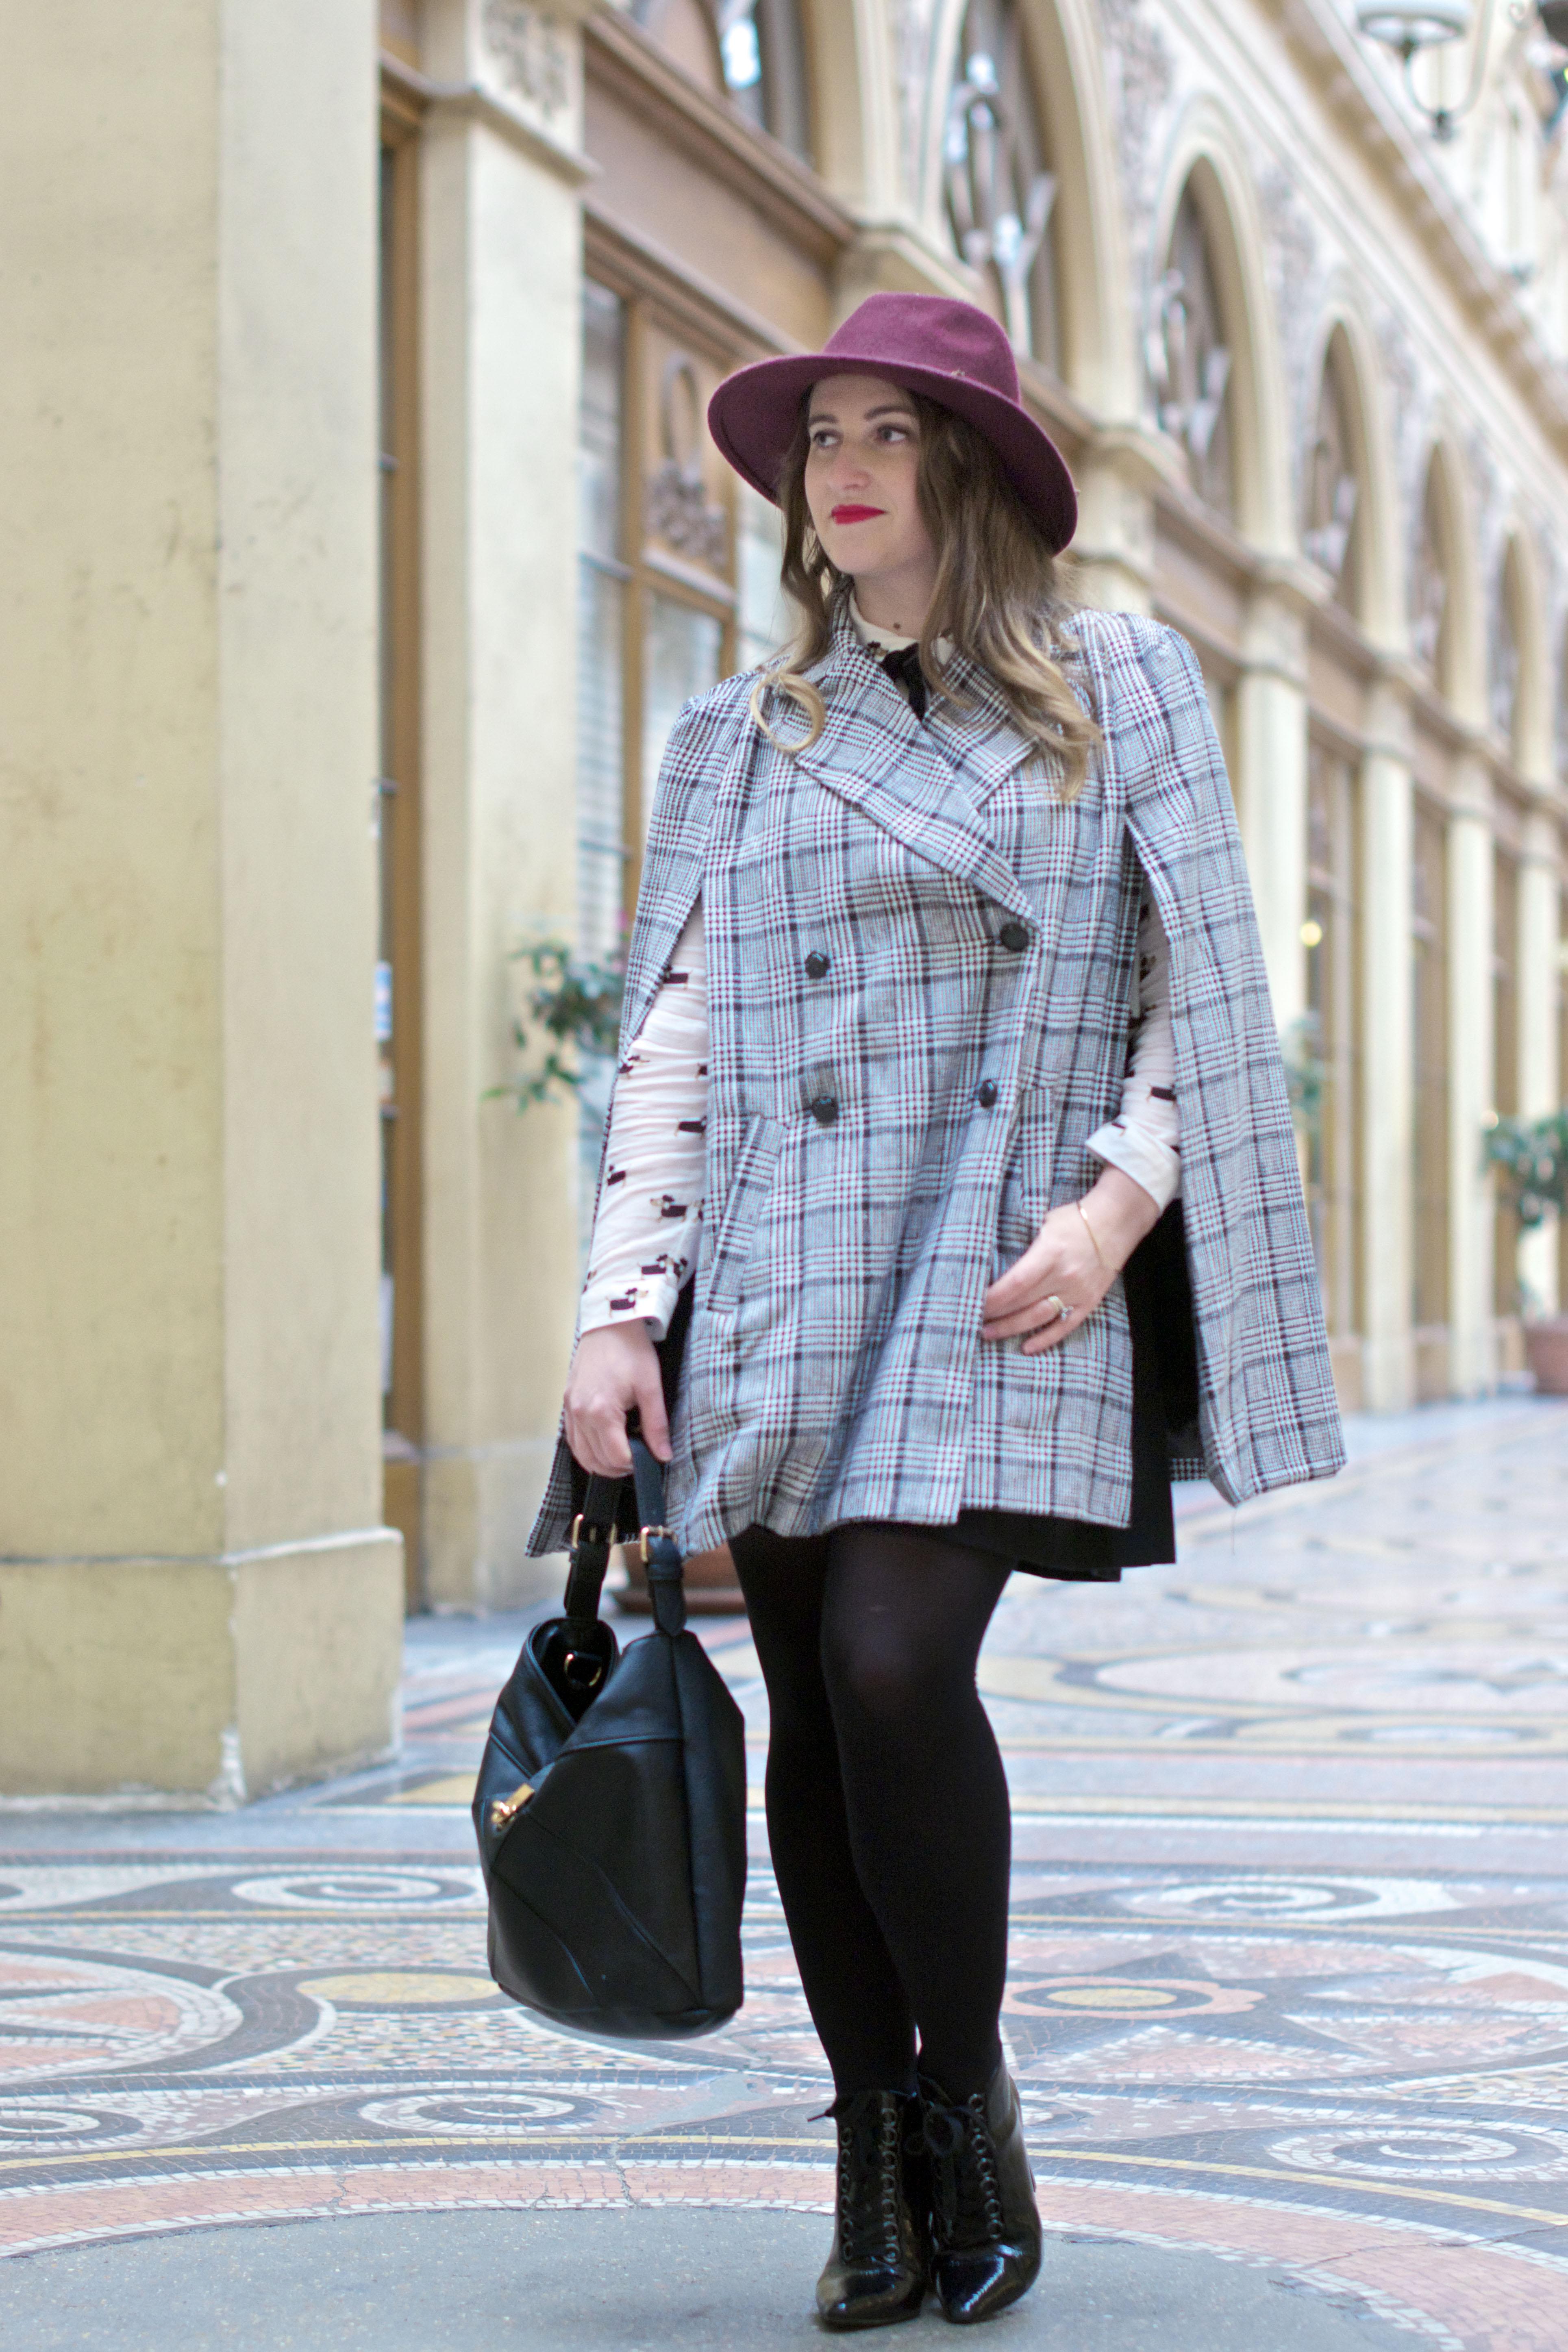 look-preppy-london-capetartan-shein-galeriesvivienne-paris-influencer-fashionblogger-chemiseretro-mango-jupepatineuse-bottineszara-vinyl-seralynepointcom_DSC3375